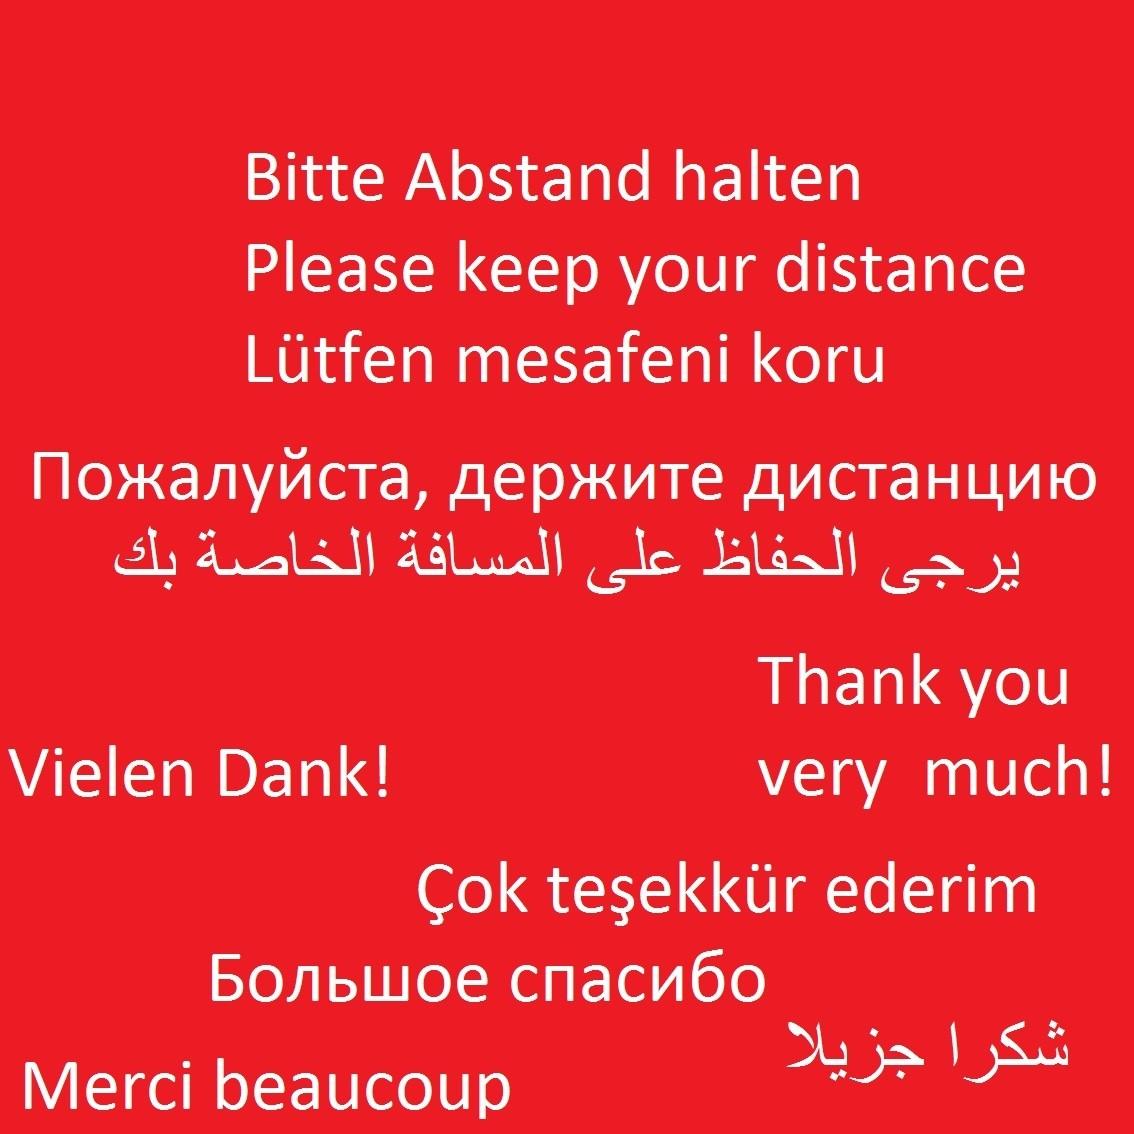 Bitte Abstand halten Aufkleber international mehrsprachig